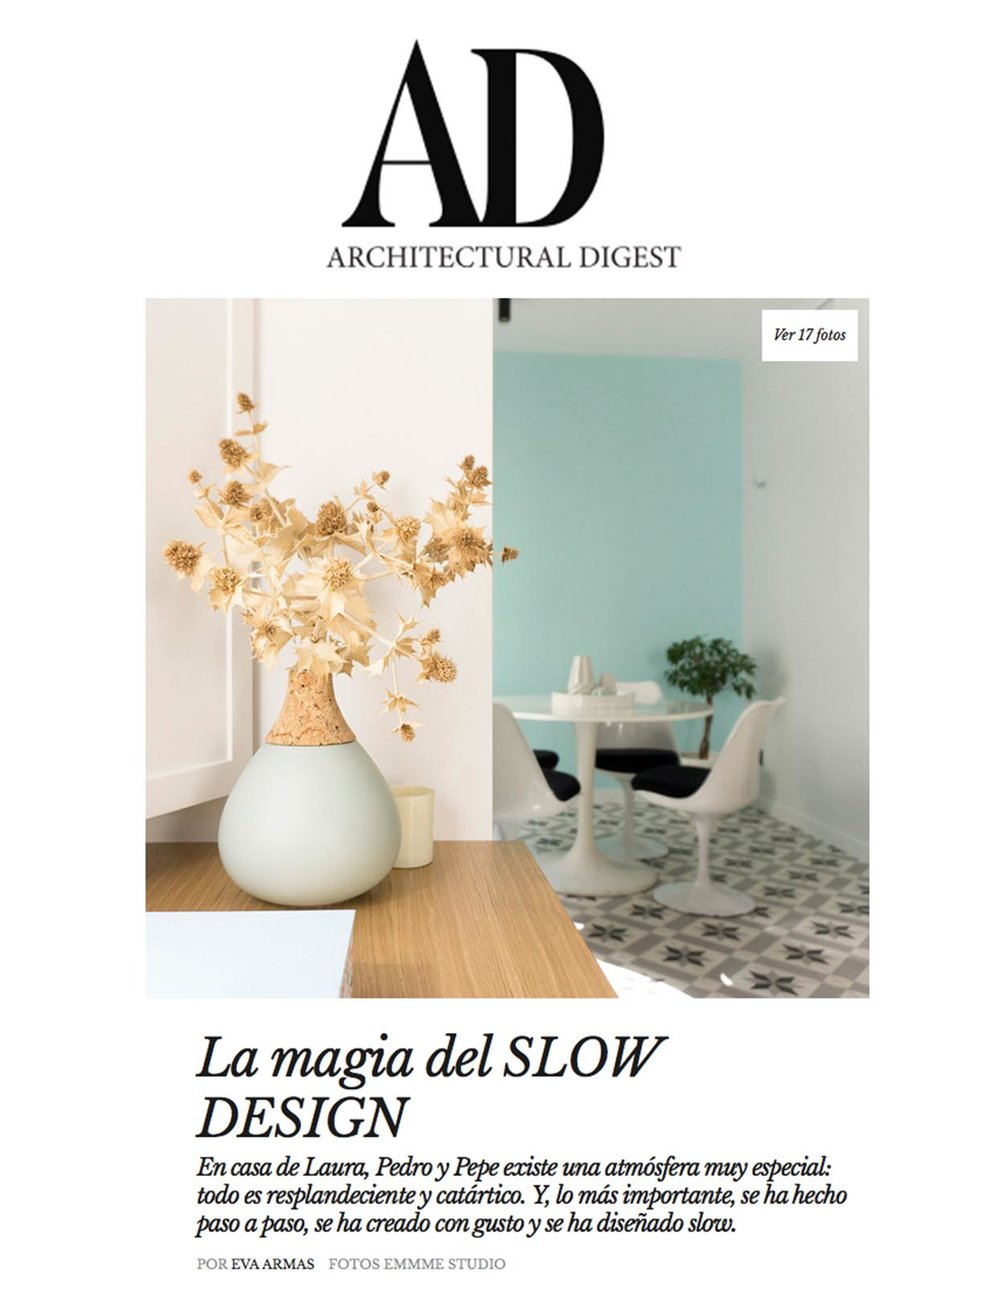 emmme studio ad reformas diseño slow prensa vivienda laura pedro y pepe.jpg